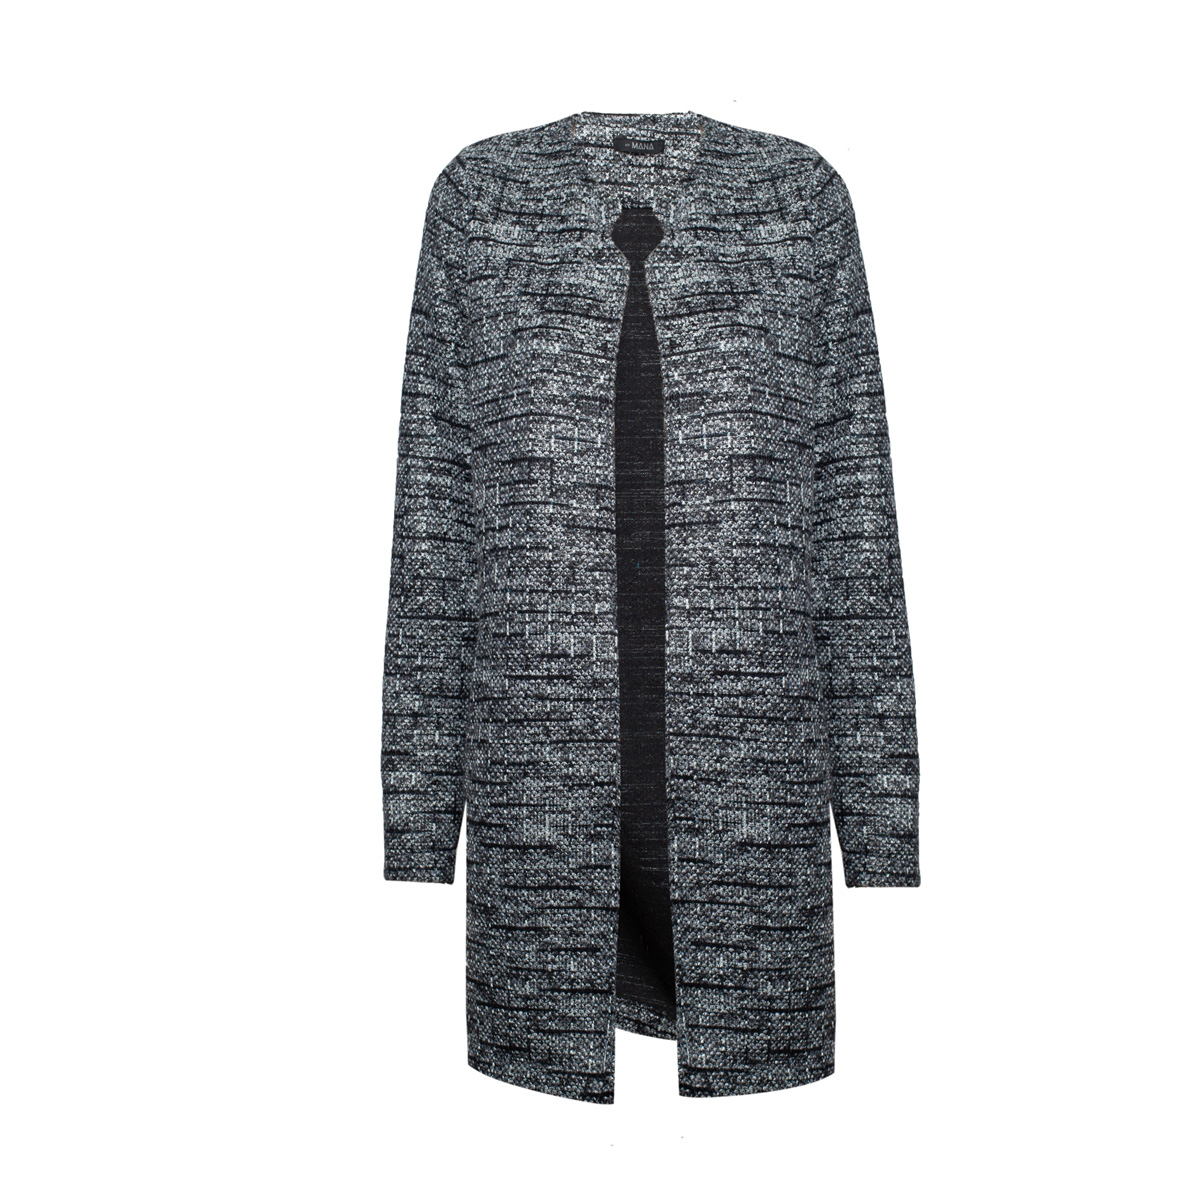 Ženska jakna, temno melange siva